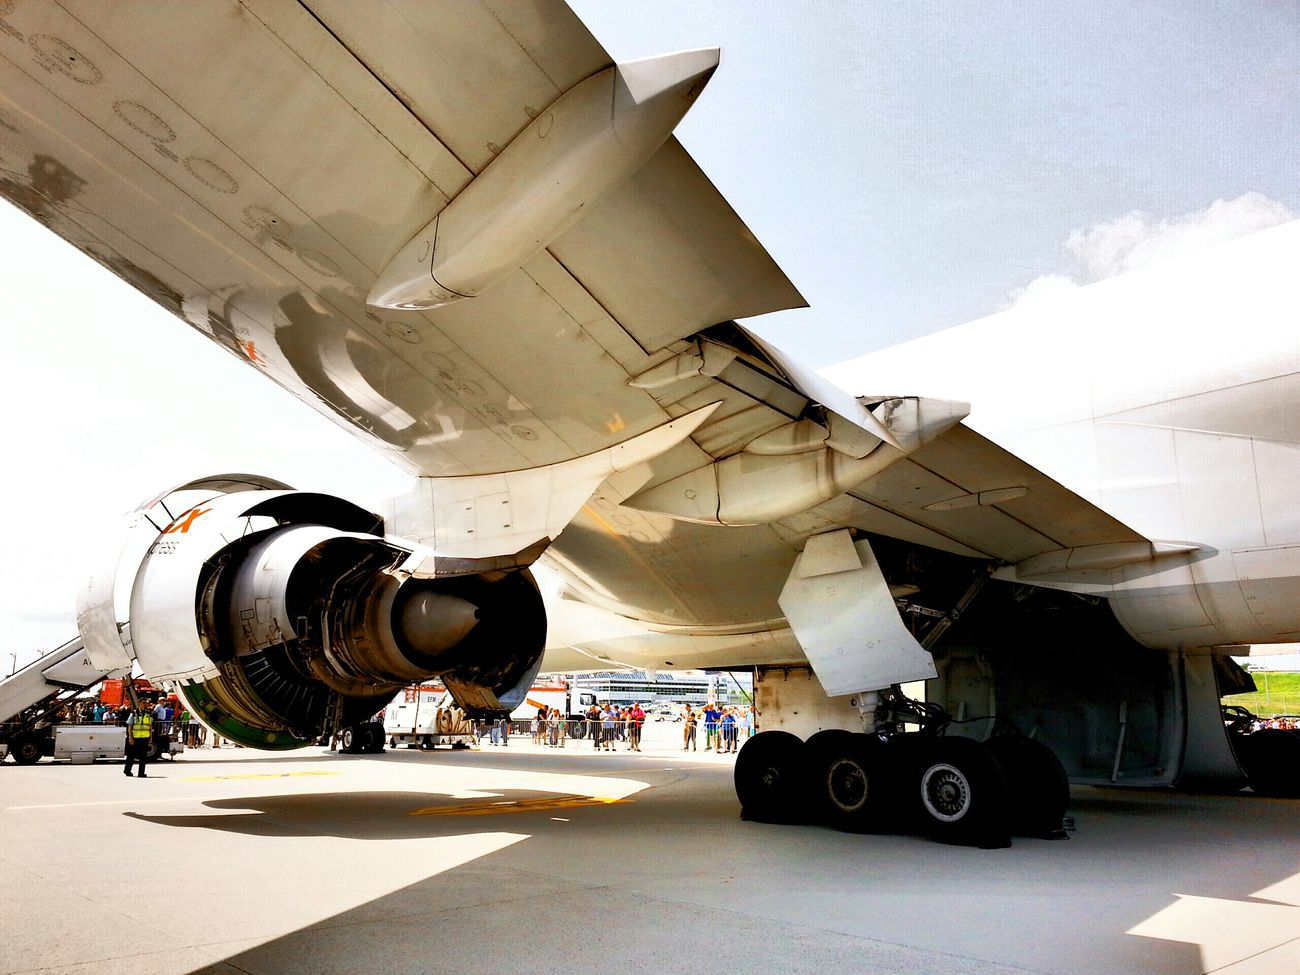 Airport Day Boeing 777 Freighter FedEx Munich Airport Under The Wing